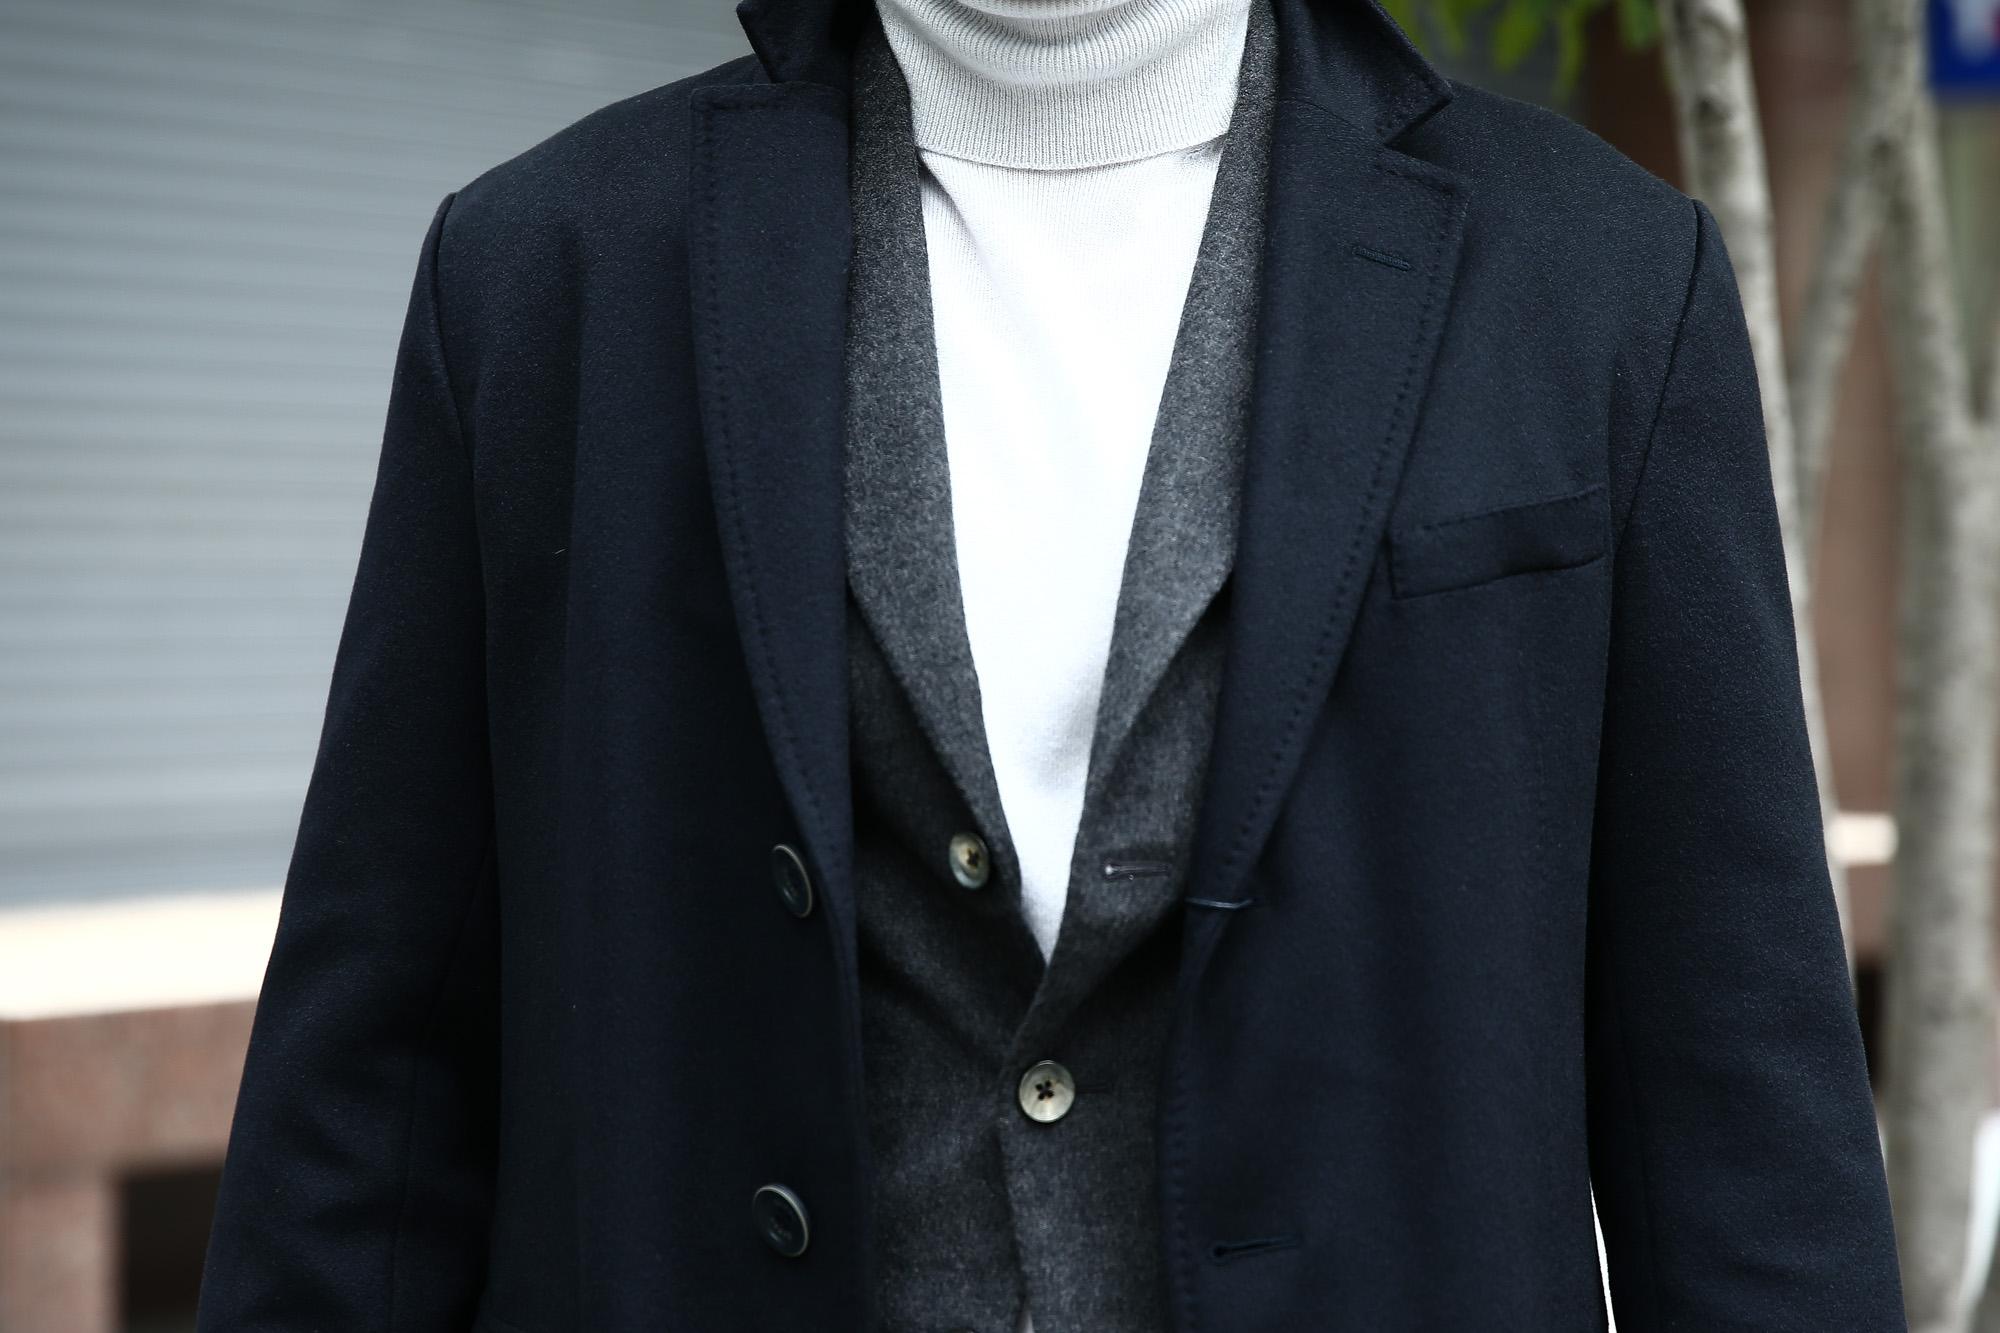 【HERNO // ヘルノ】 CA0058U Cashmere Chester coat カシミア チェスターコート PIACENZA ピアツェンツァ CASHMERE DROPGLIDE NYLON ULTRALIGHT 中綿入り カシミア チェスターコート NAVY (ネイビー・9200) Made in italy (イタリア製) 2017 秋冬新作 愛知 名古屋 ZODIAC ゾディアック herno ヘルノ ダウンコート ビジネススタイル